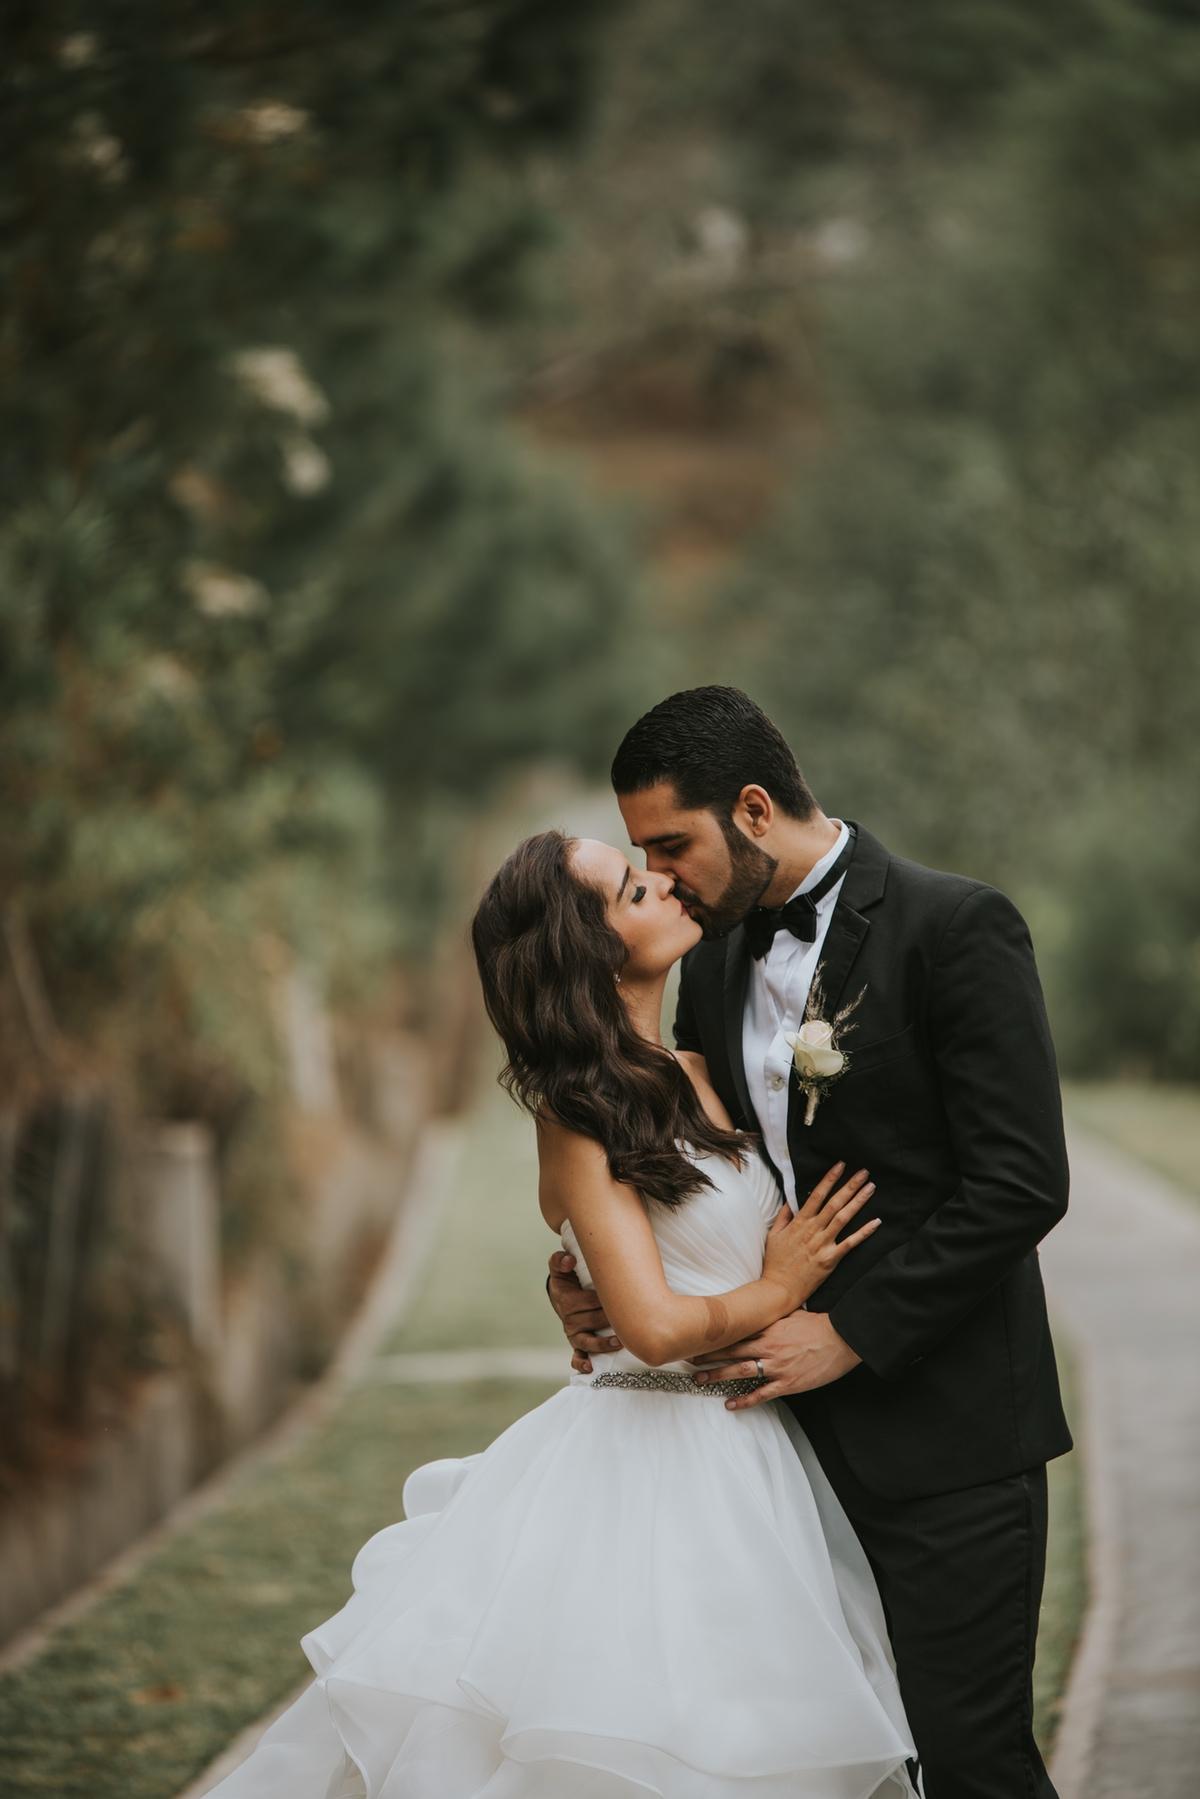 Le Cape Weddings - Creatives in Guatemala -40.jpg